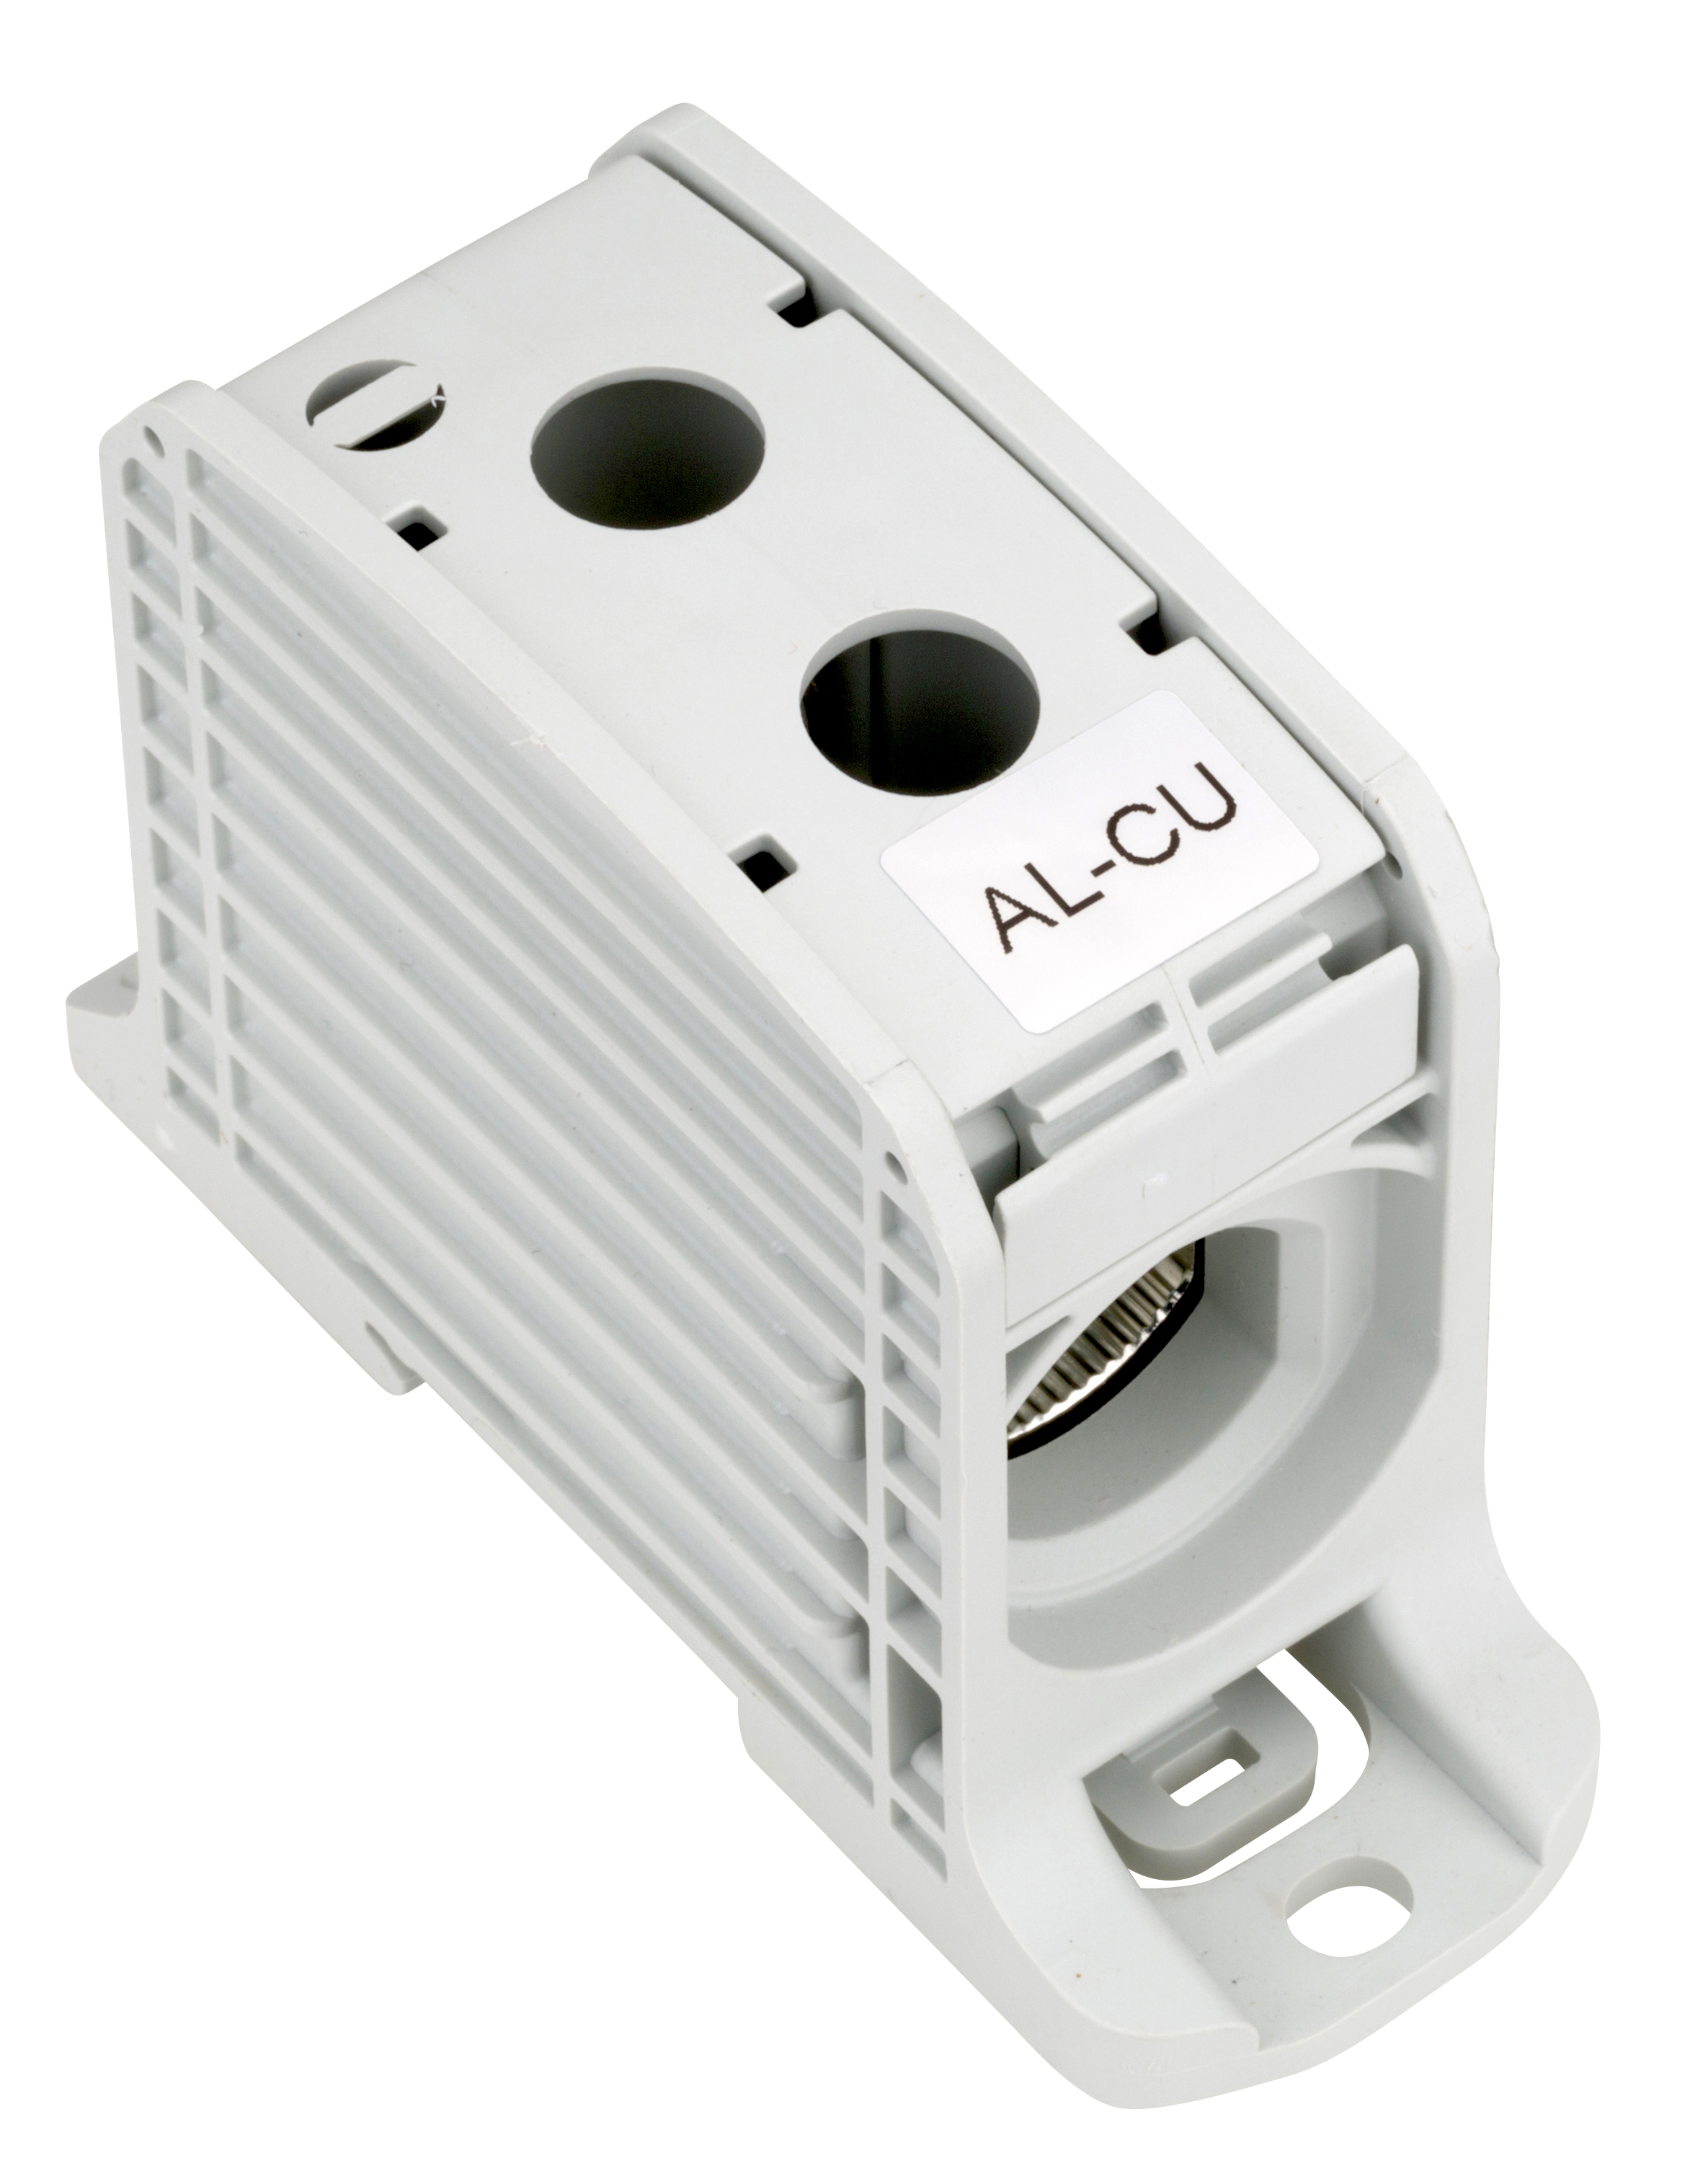 1 Stk Aluminium /Kupfer Klemme, 1-polig, 185mm² grau IKA21510--